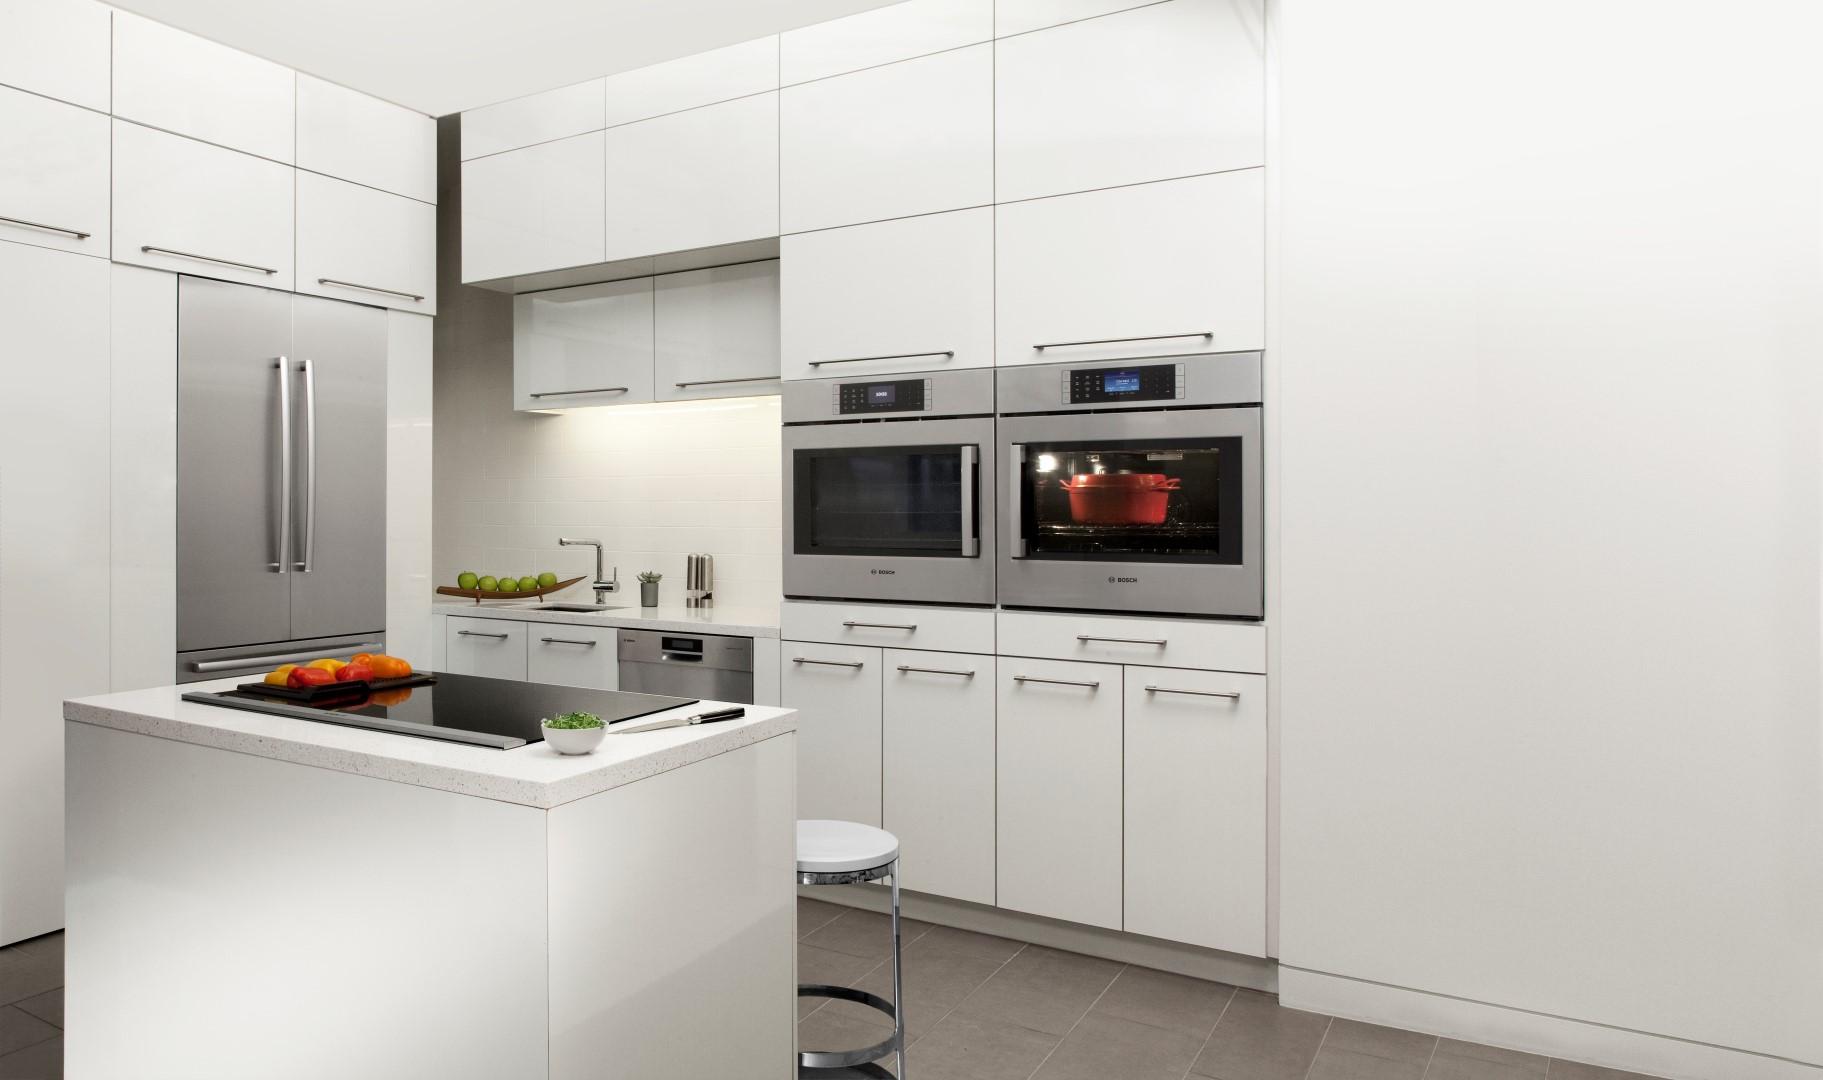 Bosch Stainless Steel Appliances